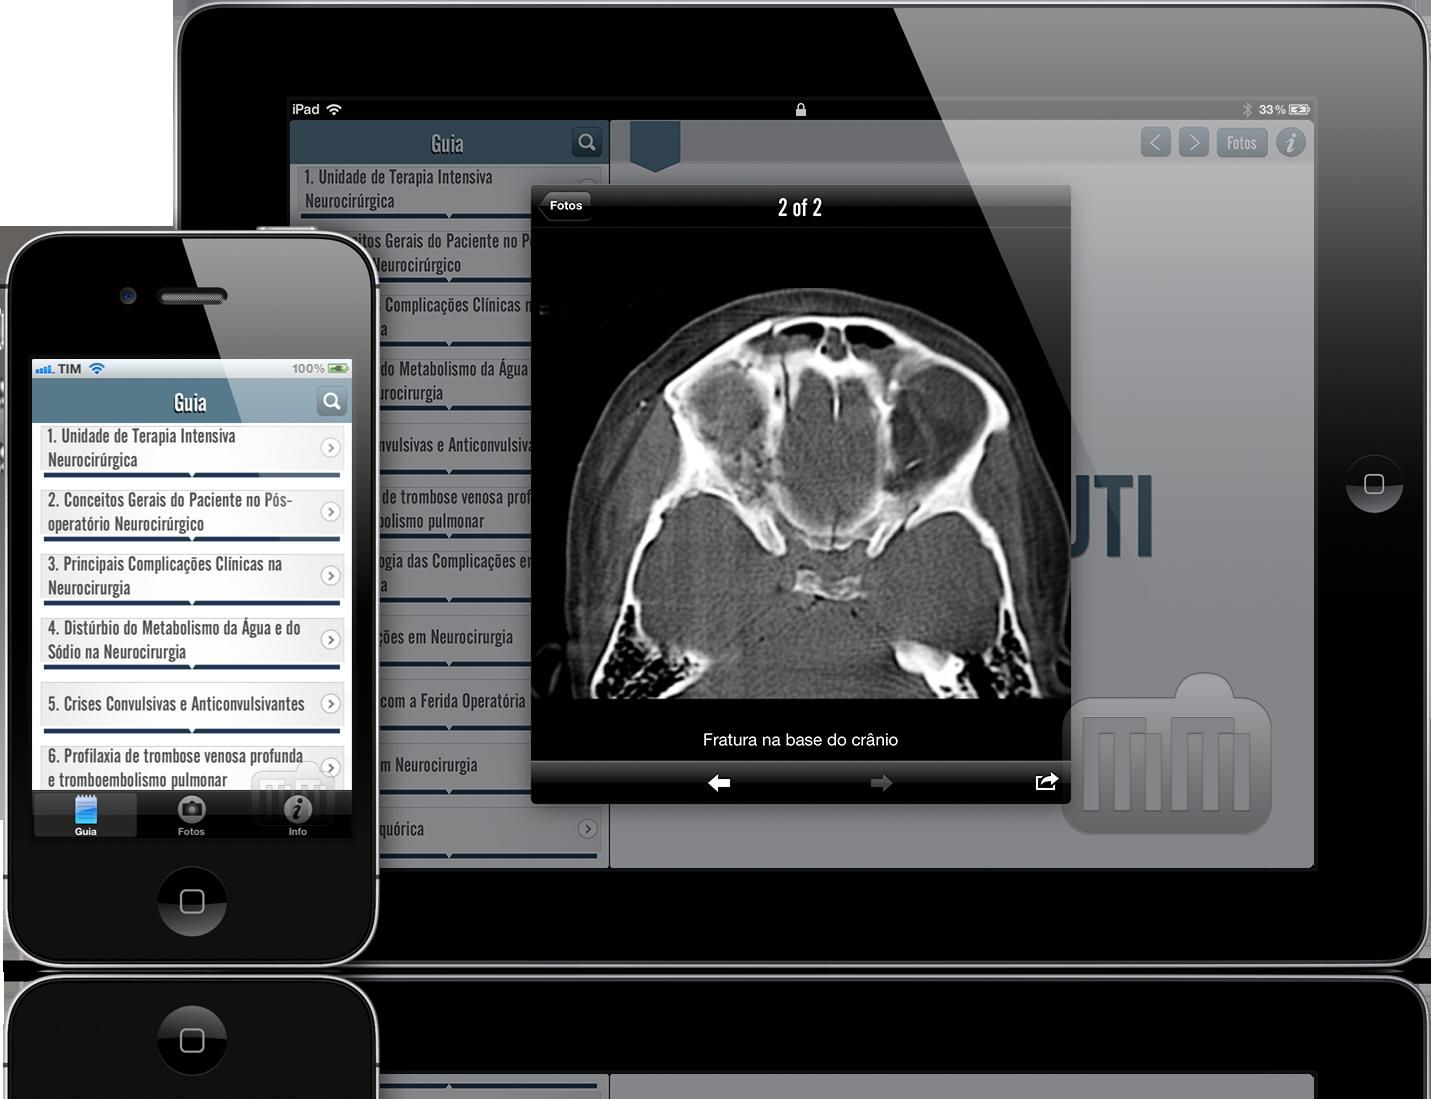 Guia de Neurocirurgia Intensiva - iPad e iPhone